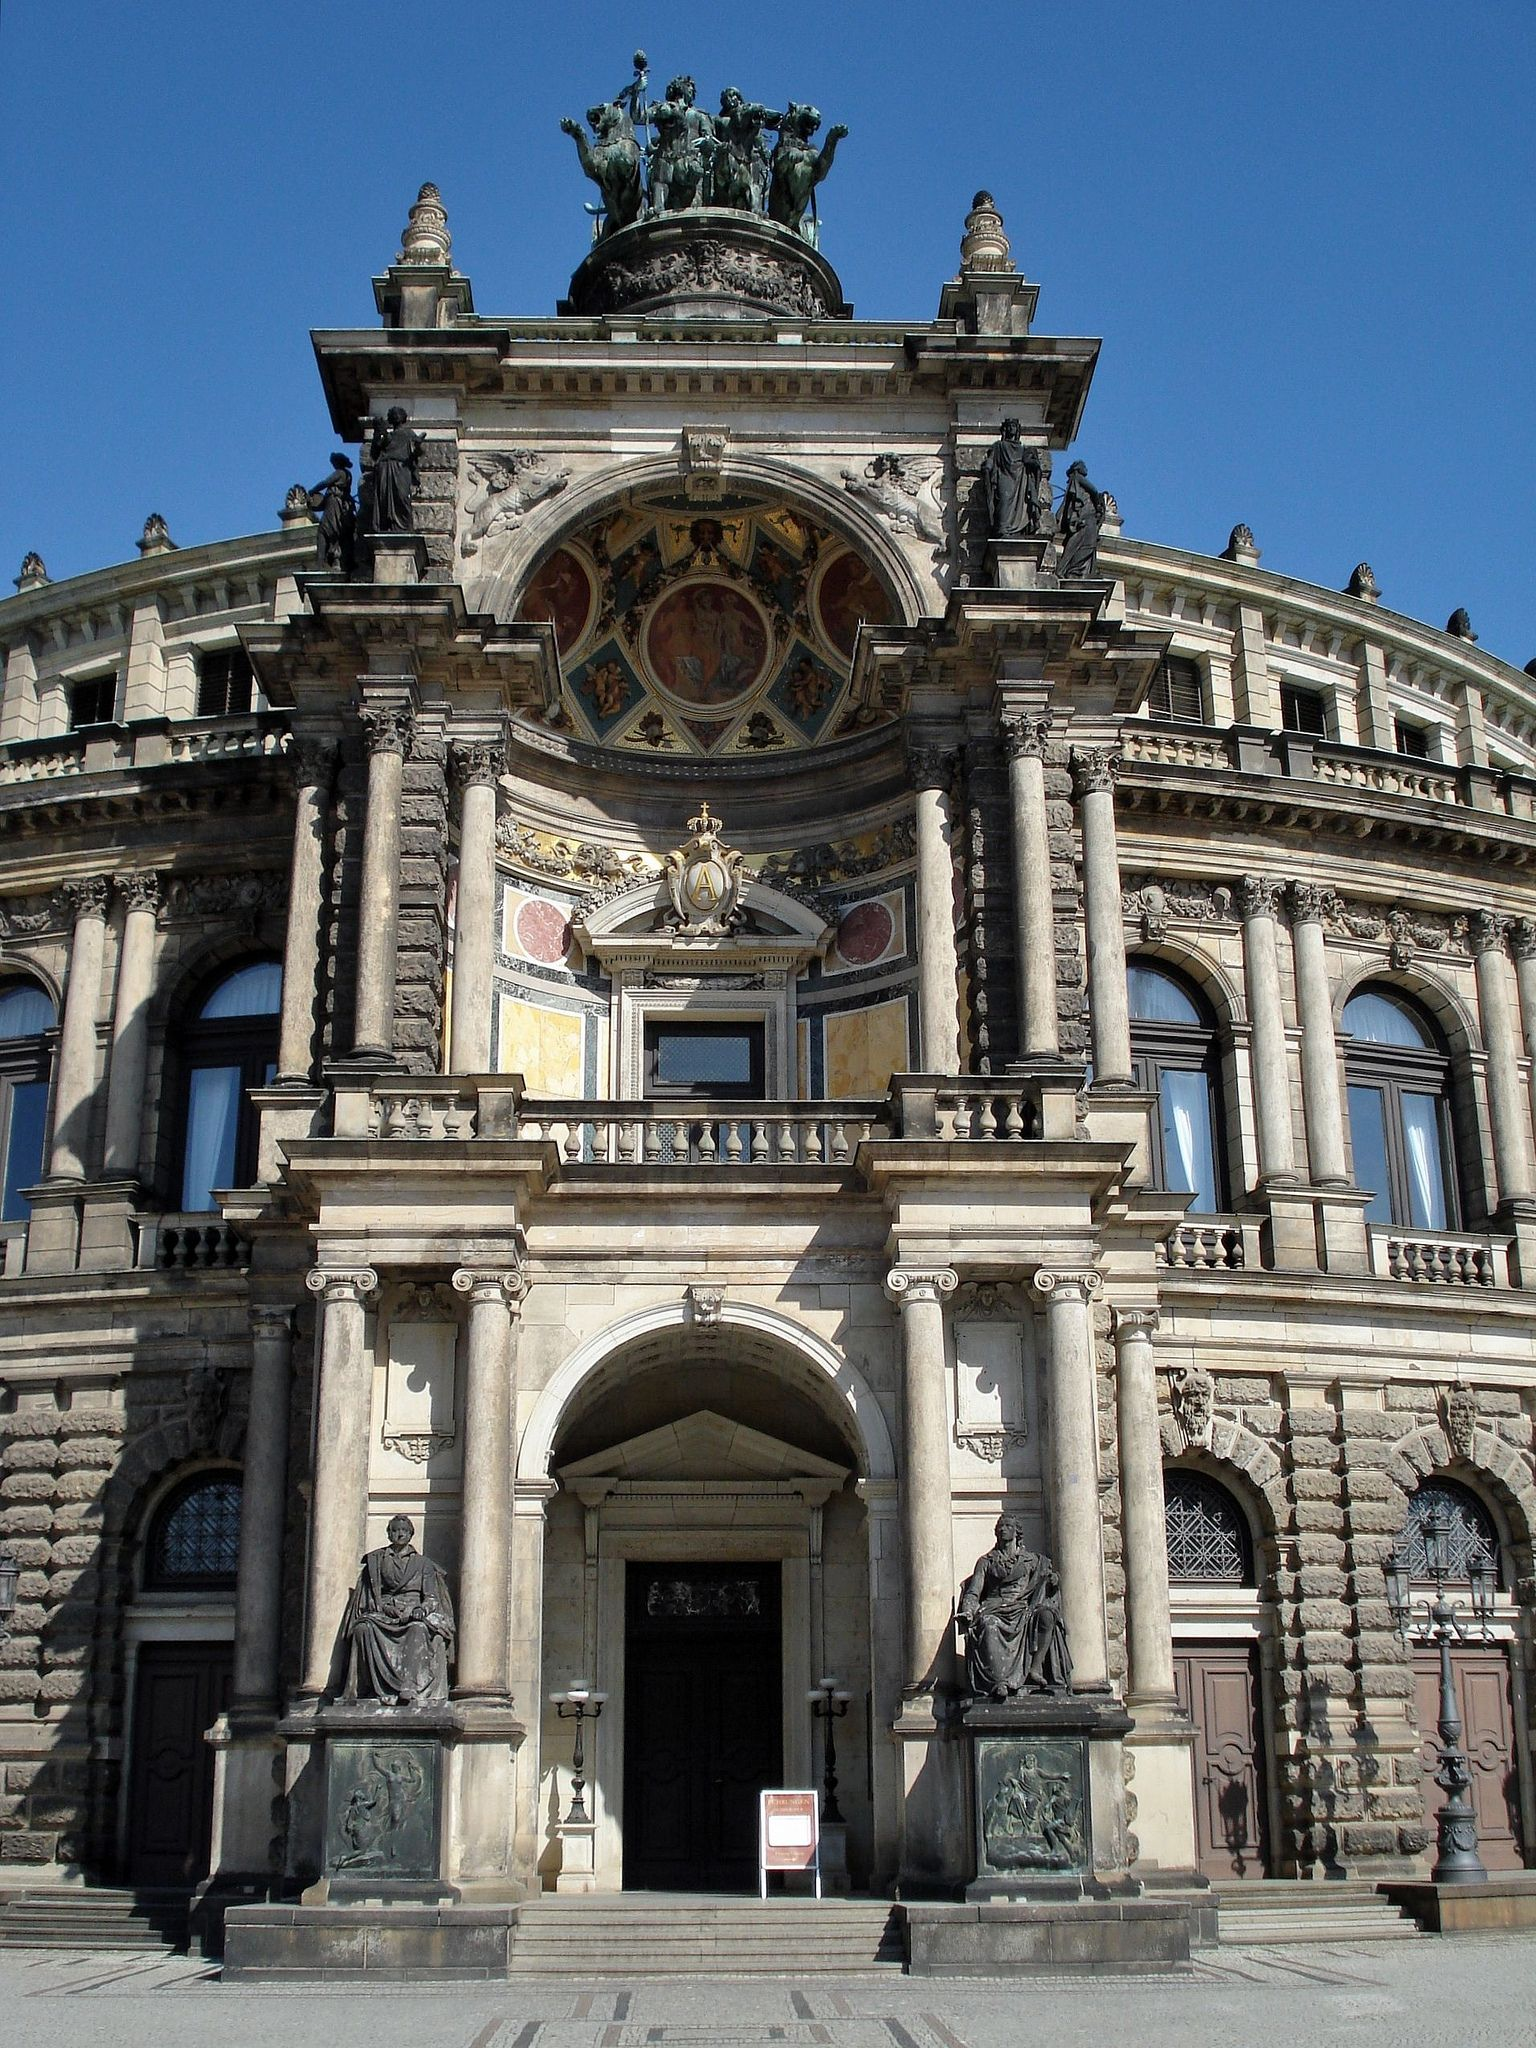 Adele Dresden 19th century neo classicism germany gottfried semper 1803 79